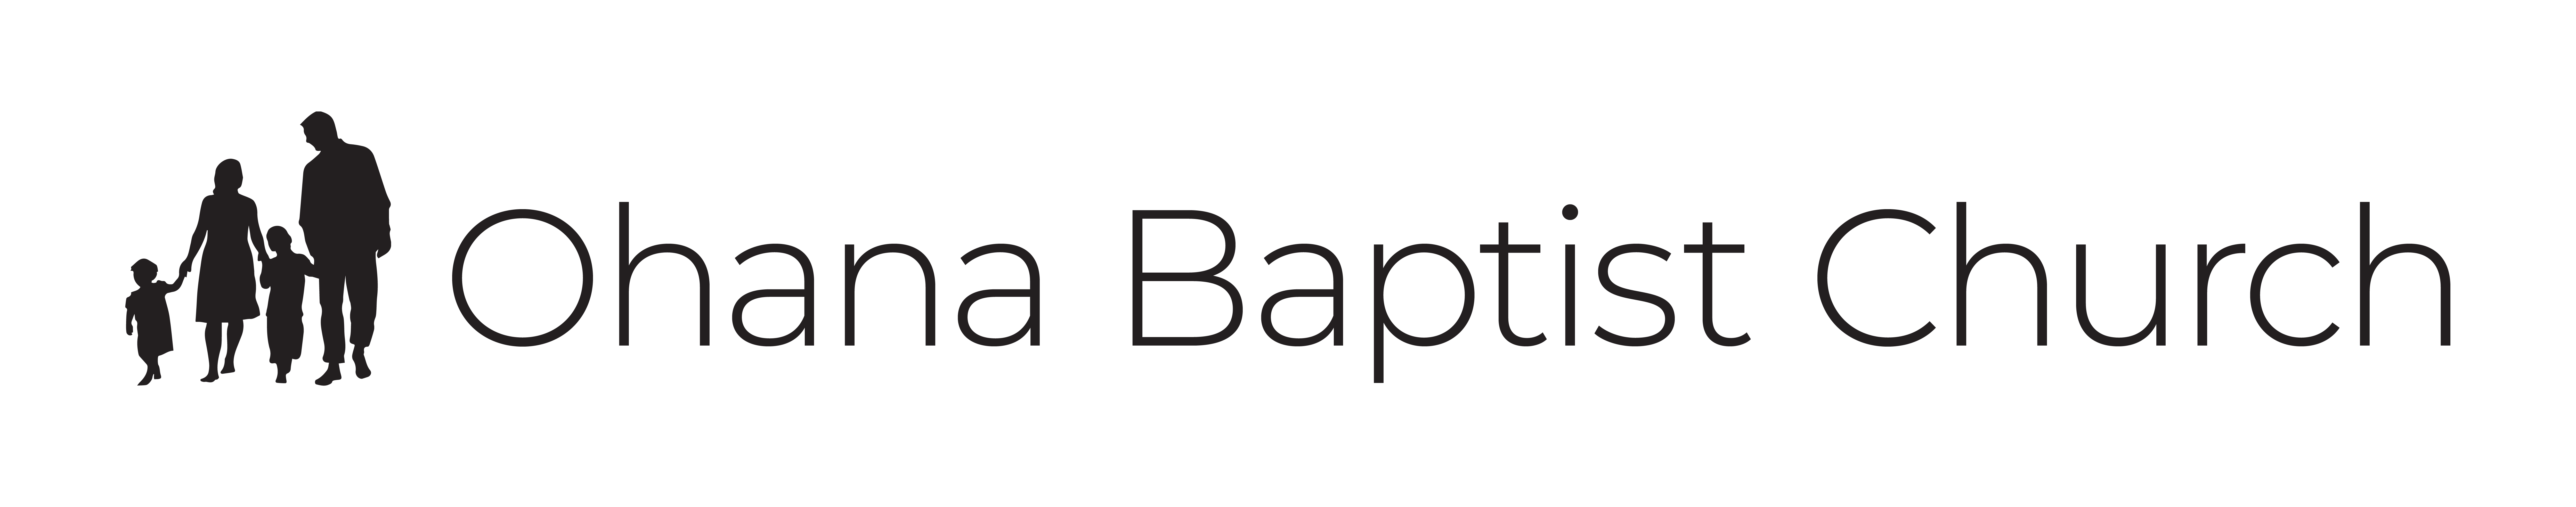 Ohana Baptist Church